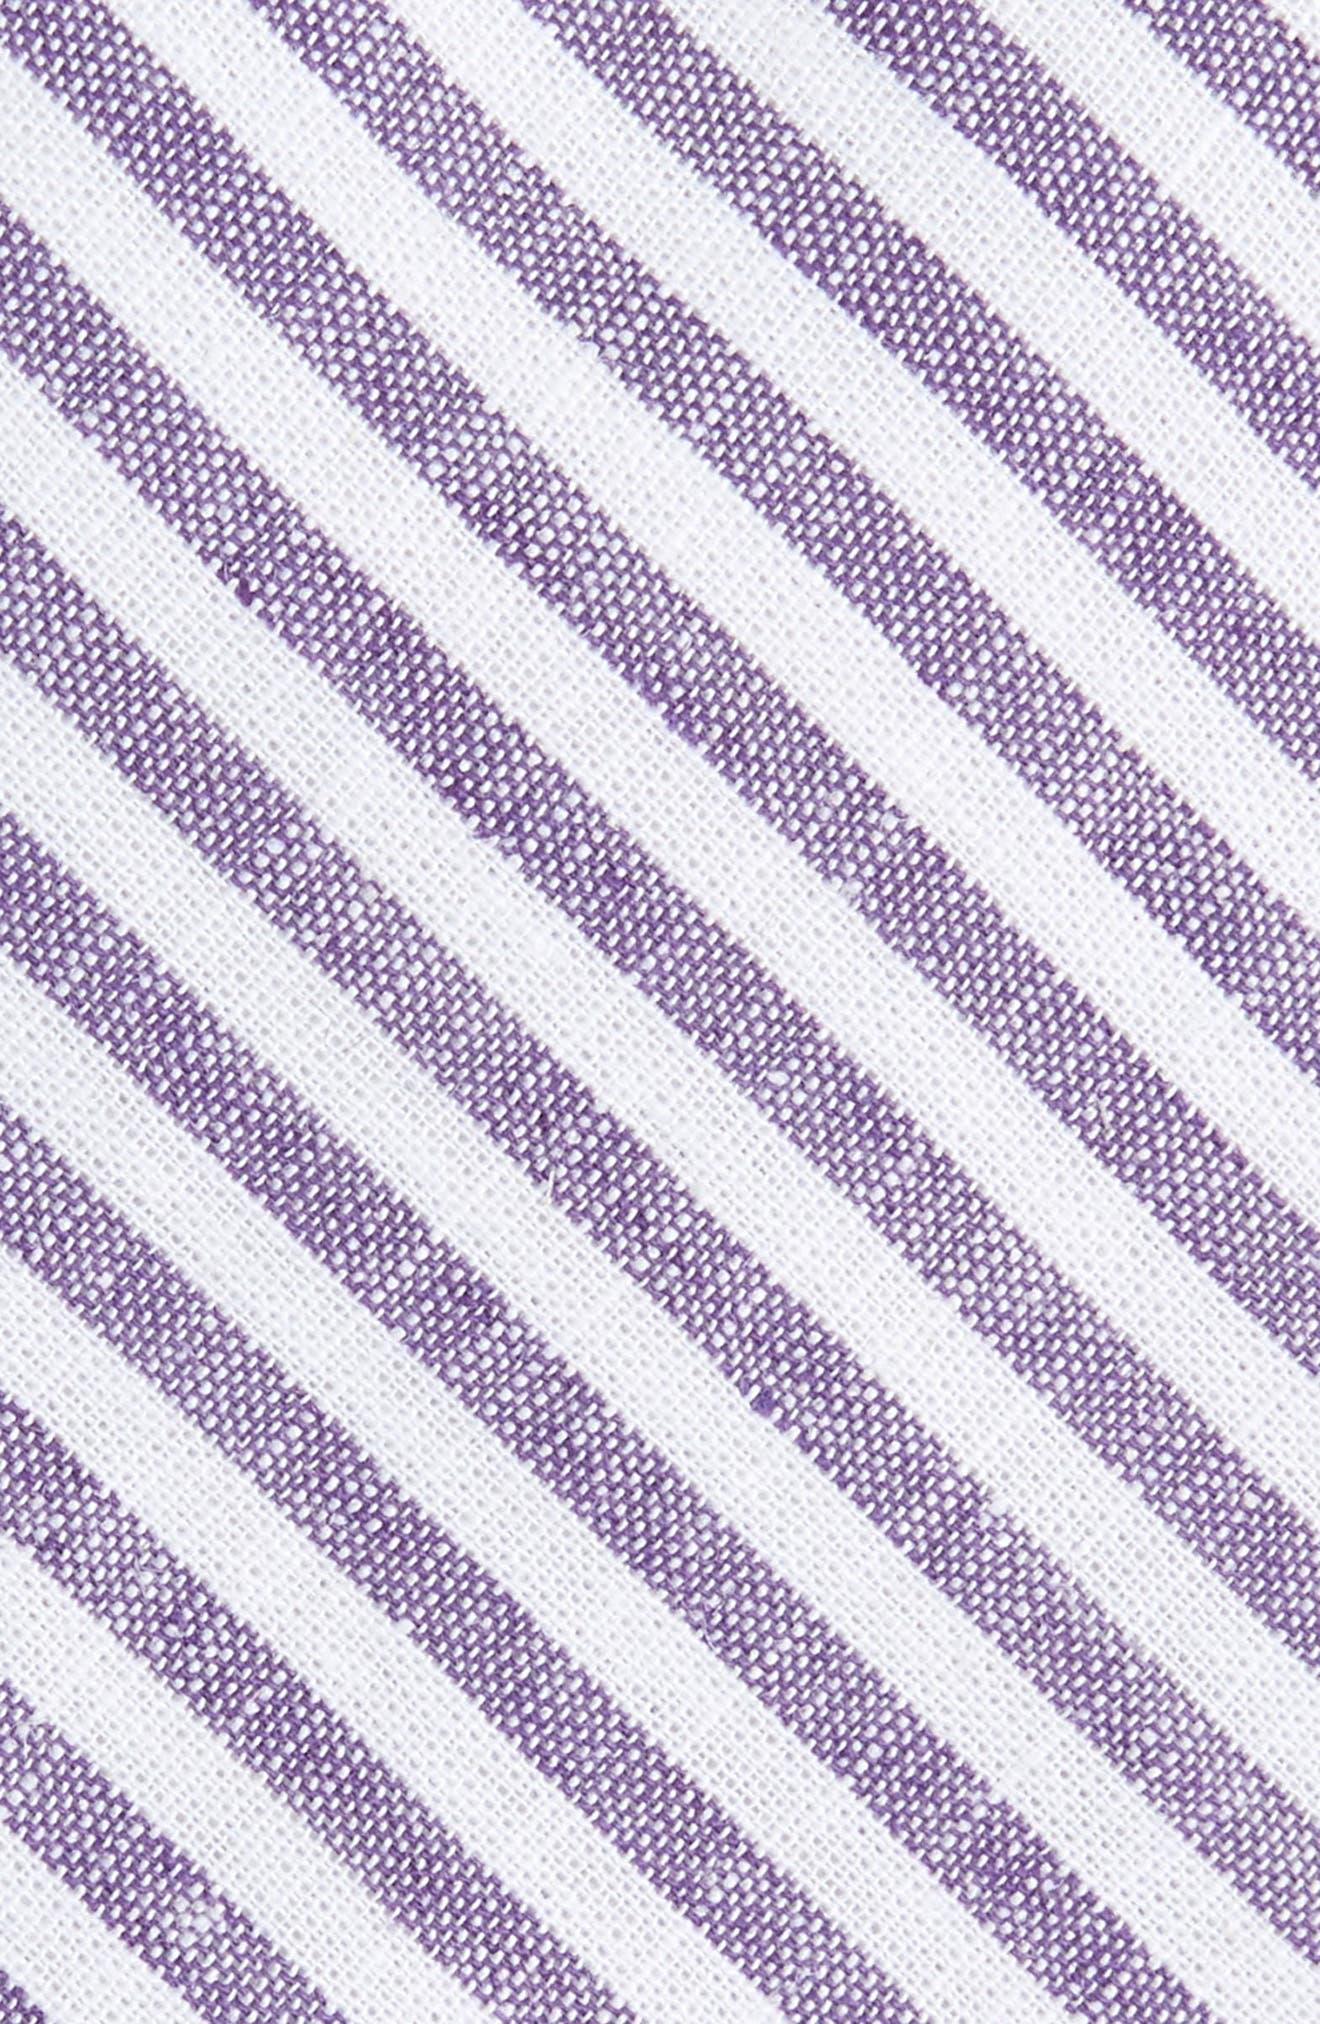 Telary Stripe Cotton Skinny Tie,                             Alternate thumbnail 5, color,